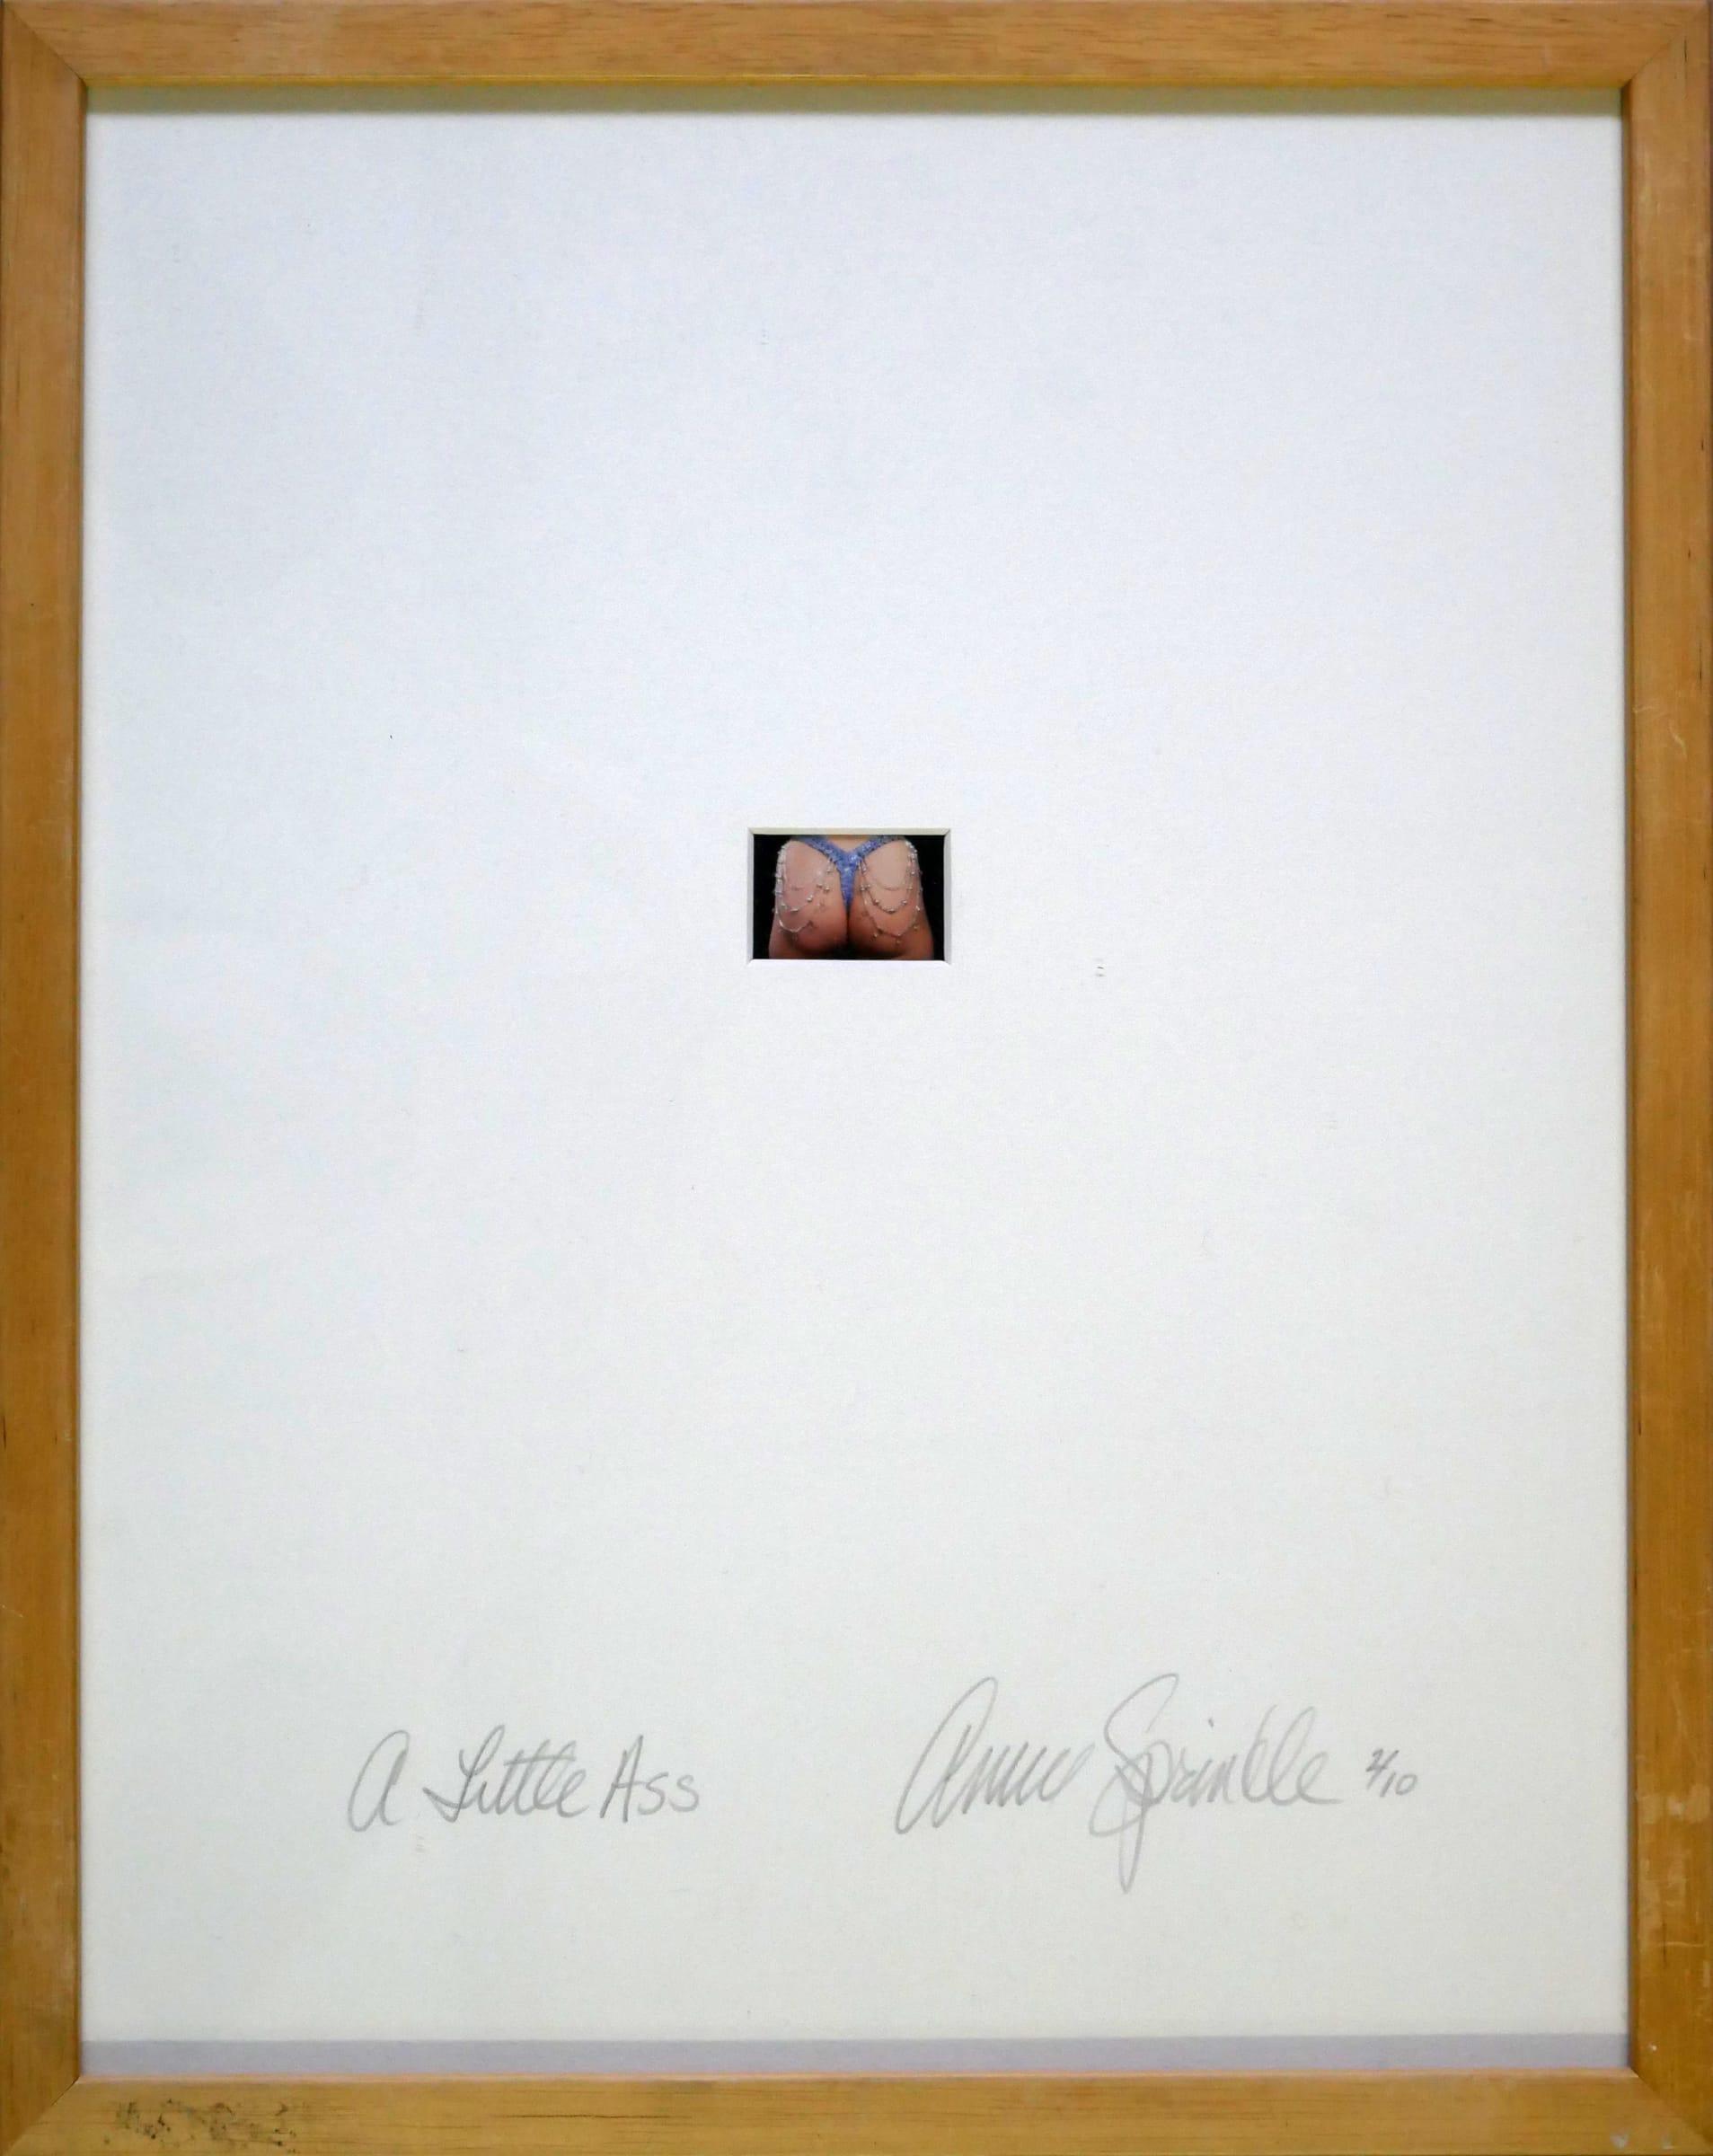 "<span class=""link fancybox-details-link""><a href=""/artists/113-annie-sprinkle/works/1337/"">View Detail Page</a></span><div class=""artist""><strong>Annie SPRINKLE</strong></div> <div class=""title""><em>A little ass</em>, 1999</div> <div class=""medium"">C-print on card board</div> <div class=""dimensions"">2 x 3.3 cm<br /> </div> <div class=""edition_details"">Edition of 10: this is 2/10</div><div class=""copyright_line"">Copyright the artist </div>"